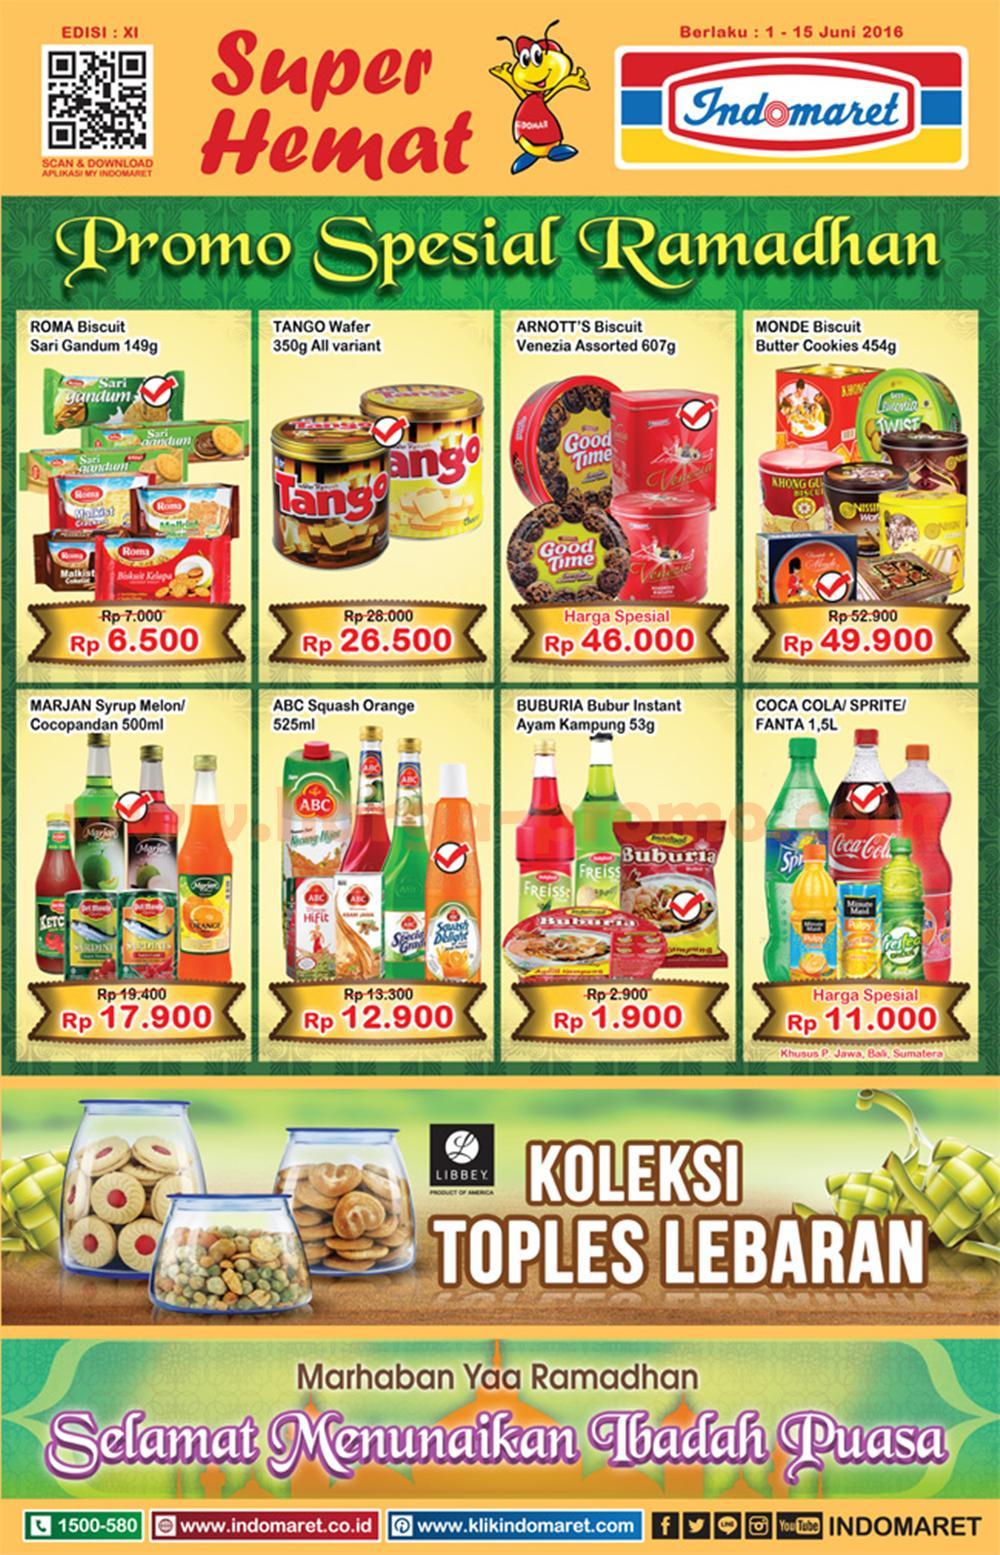 Katalog Indomaret Promo Indomaret Terbaru Periode 01 15 Juni 2016